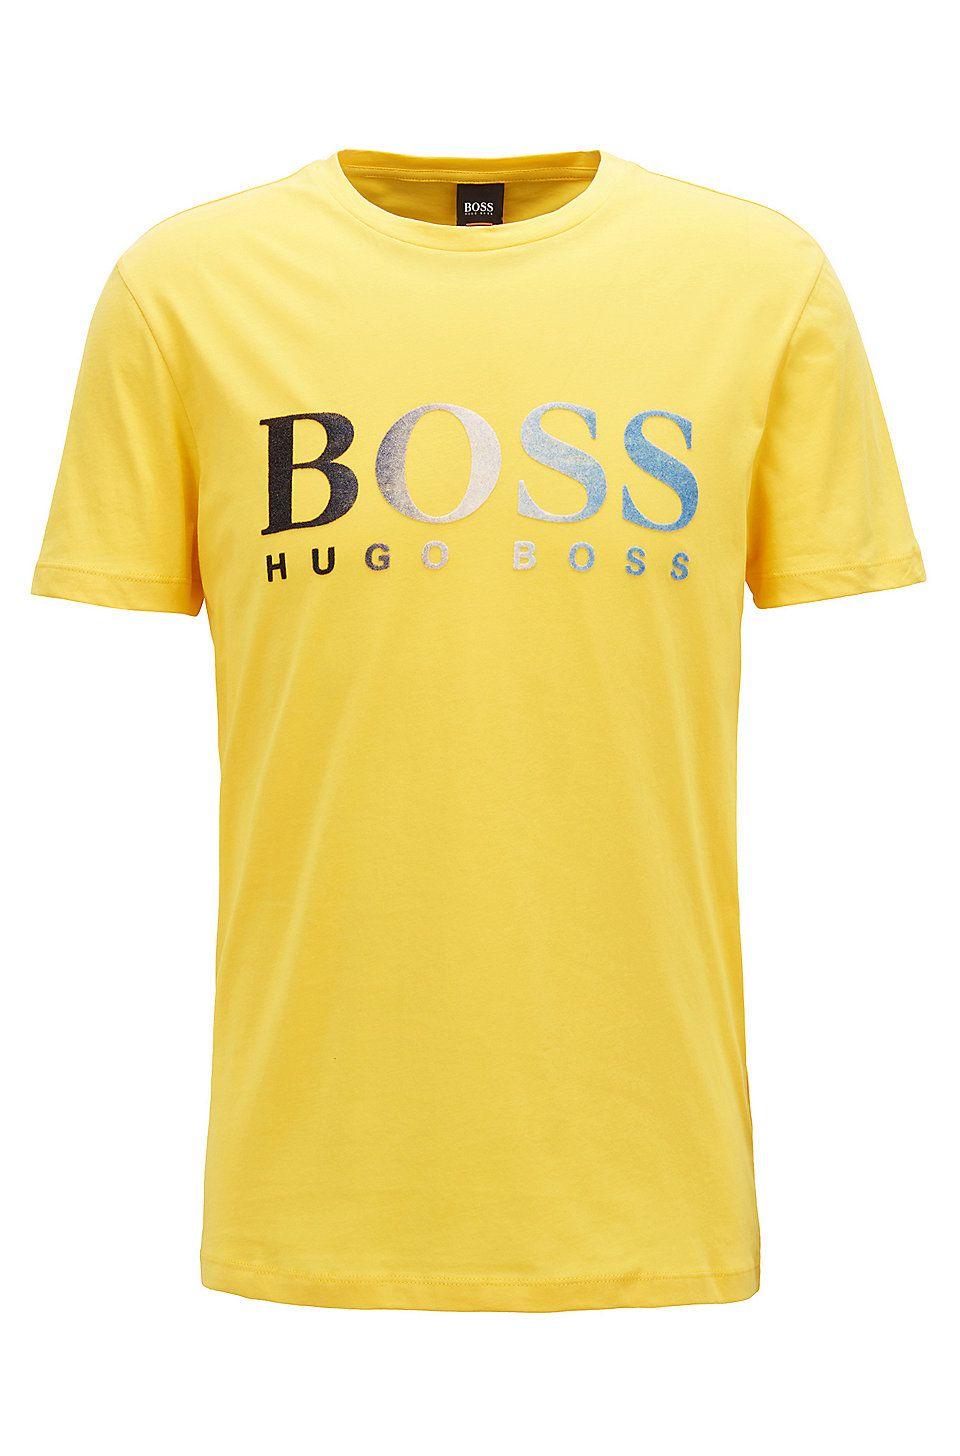 Pin on Tee Shirt for Men | Fashion T Shirt | Casual T Shirt Outfit